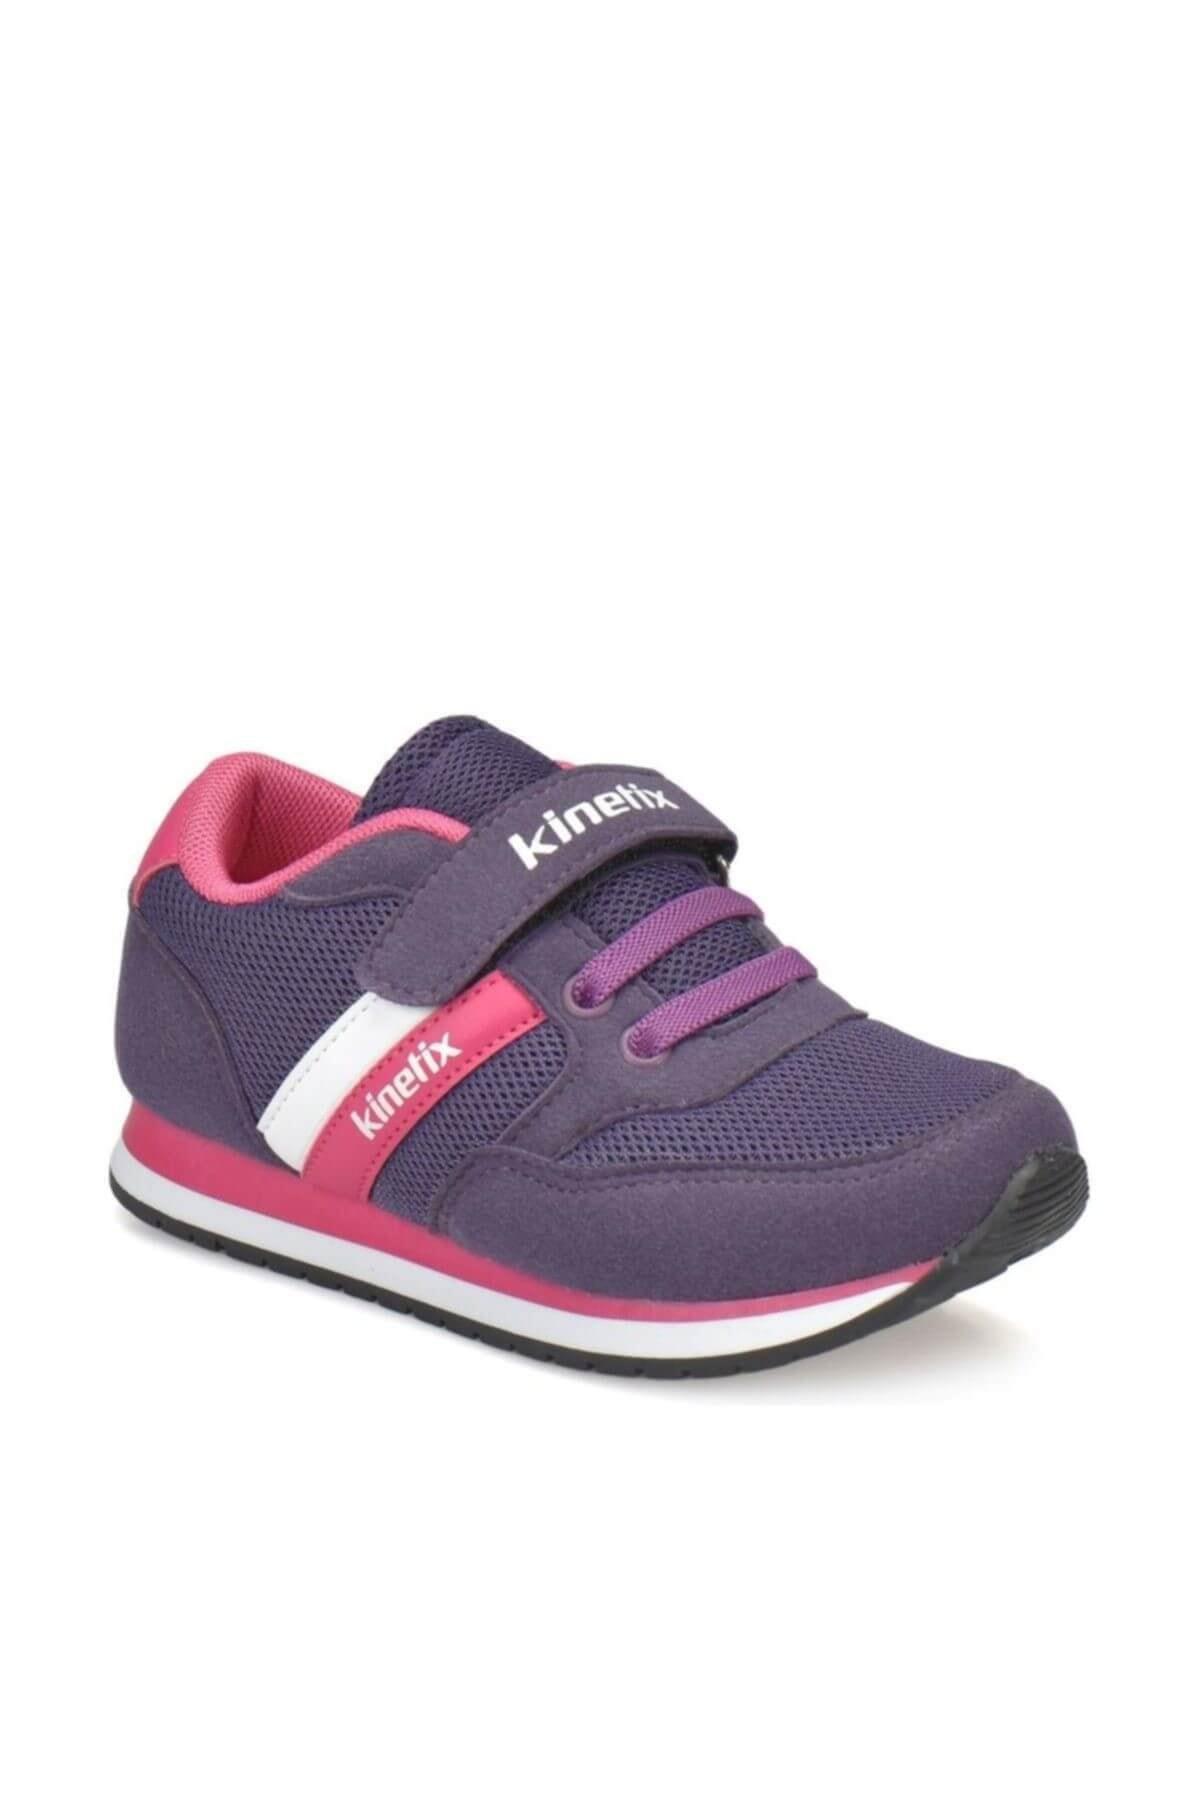 Kinetix PAYOF Mor Fuşya Beyaz Kız Çocuk Sneaker 100294201 1